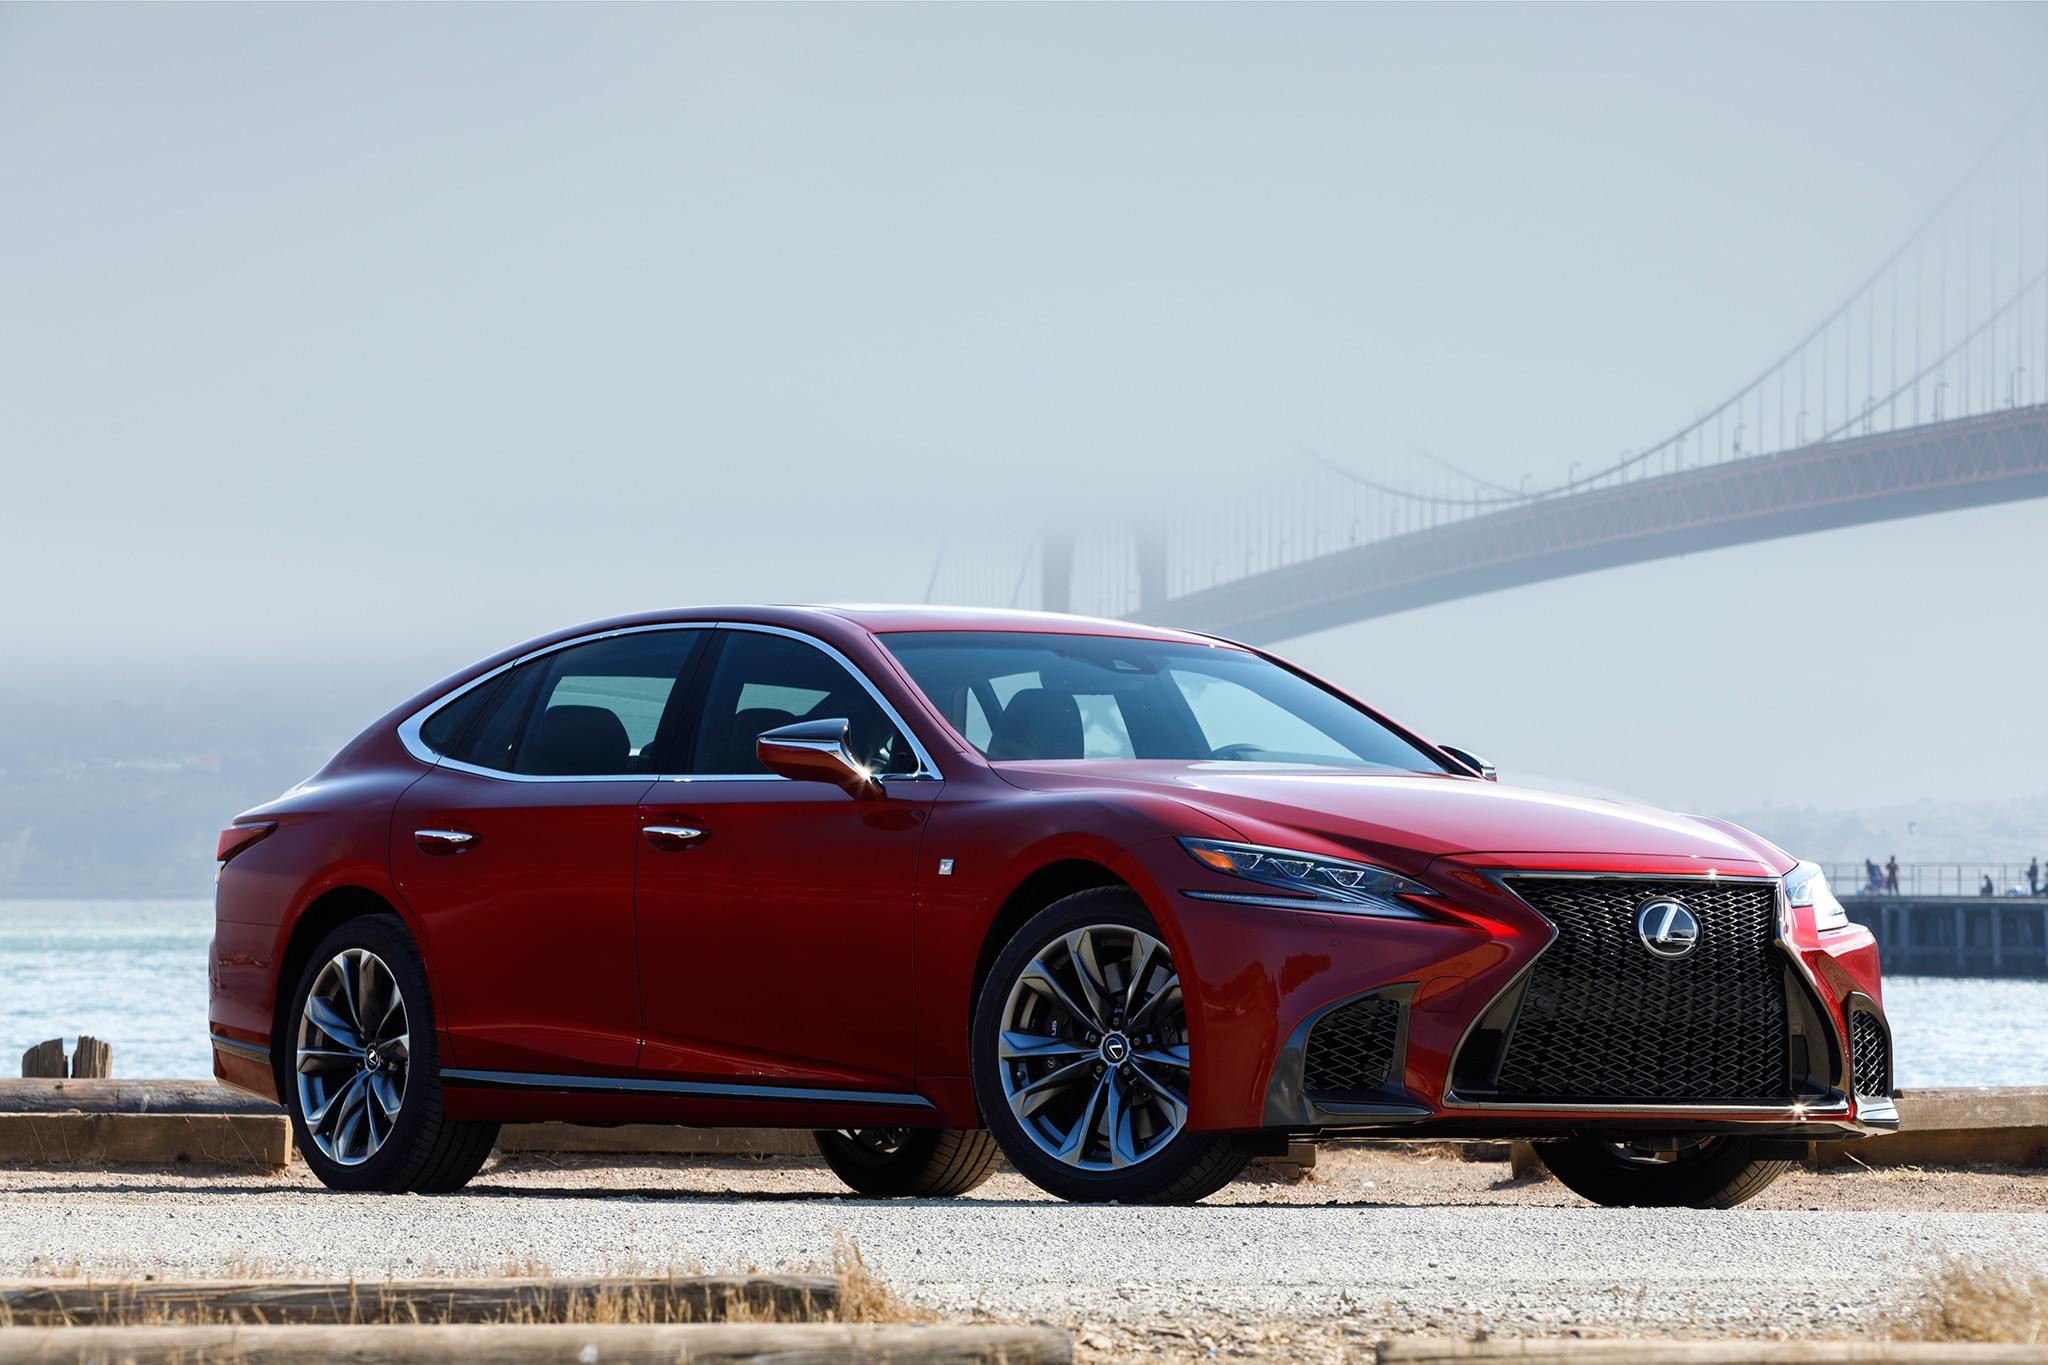 2018 Lexus LS 500 F Sport Adds Visual Aggression, Handling ...